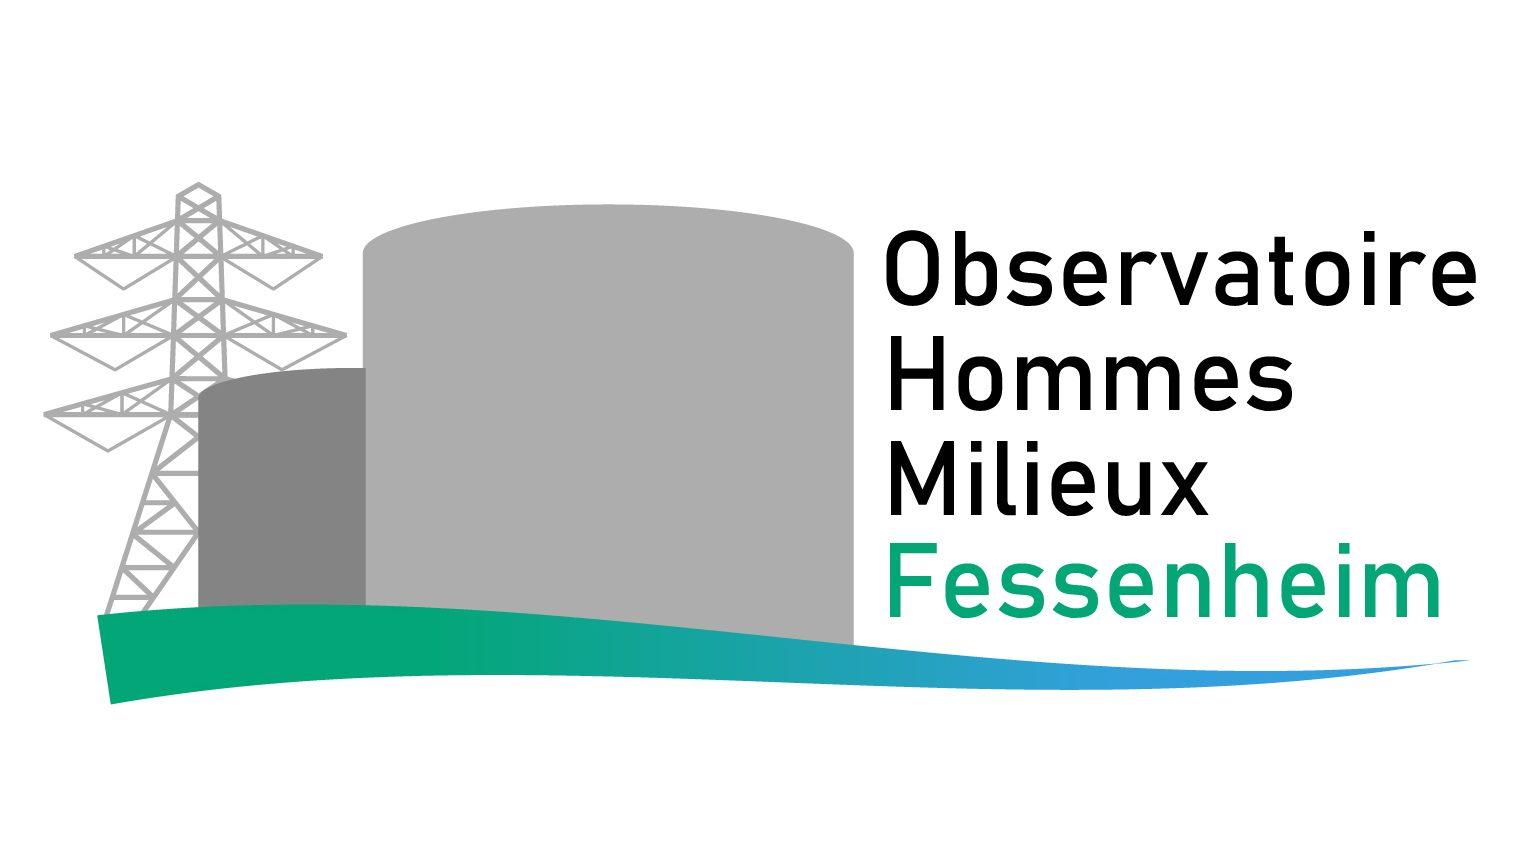 OHM Fessenheim